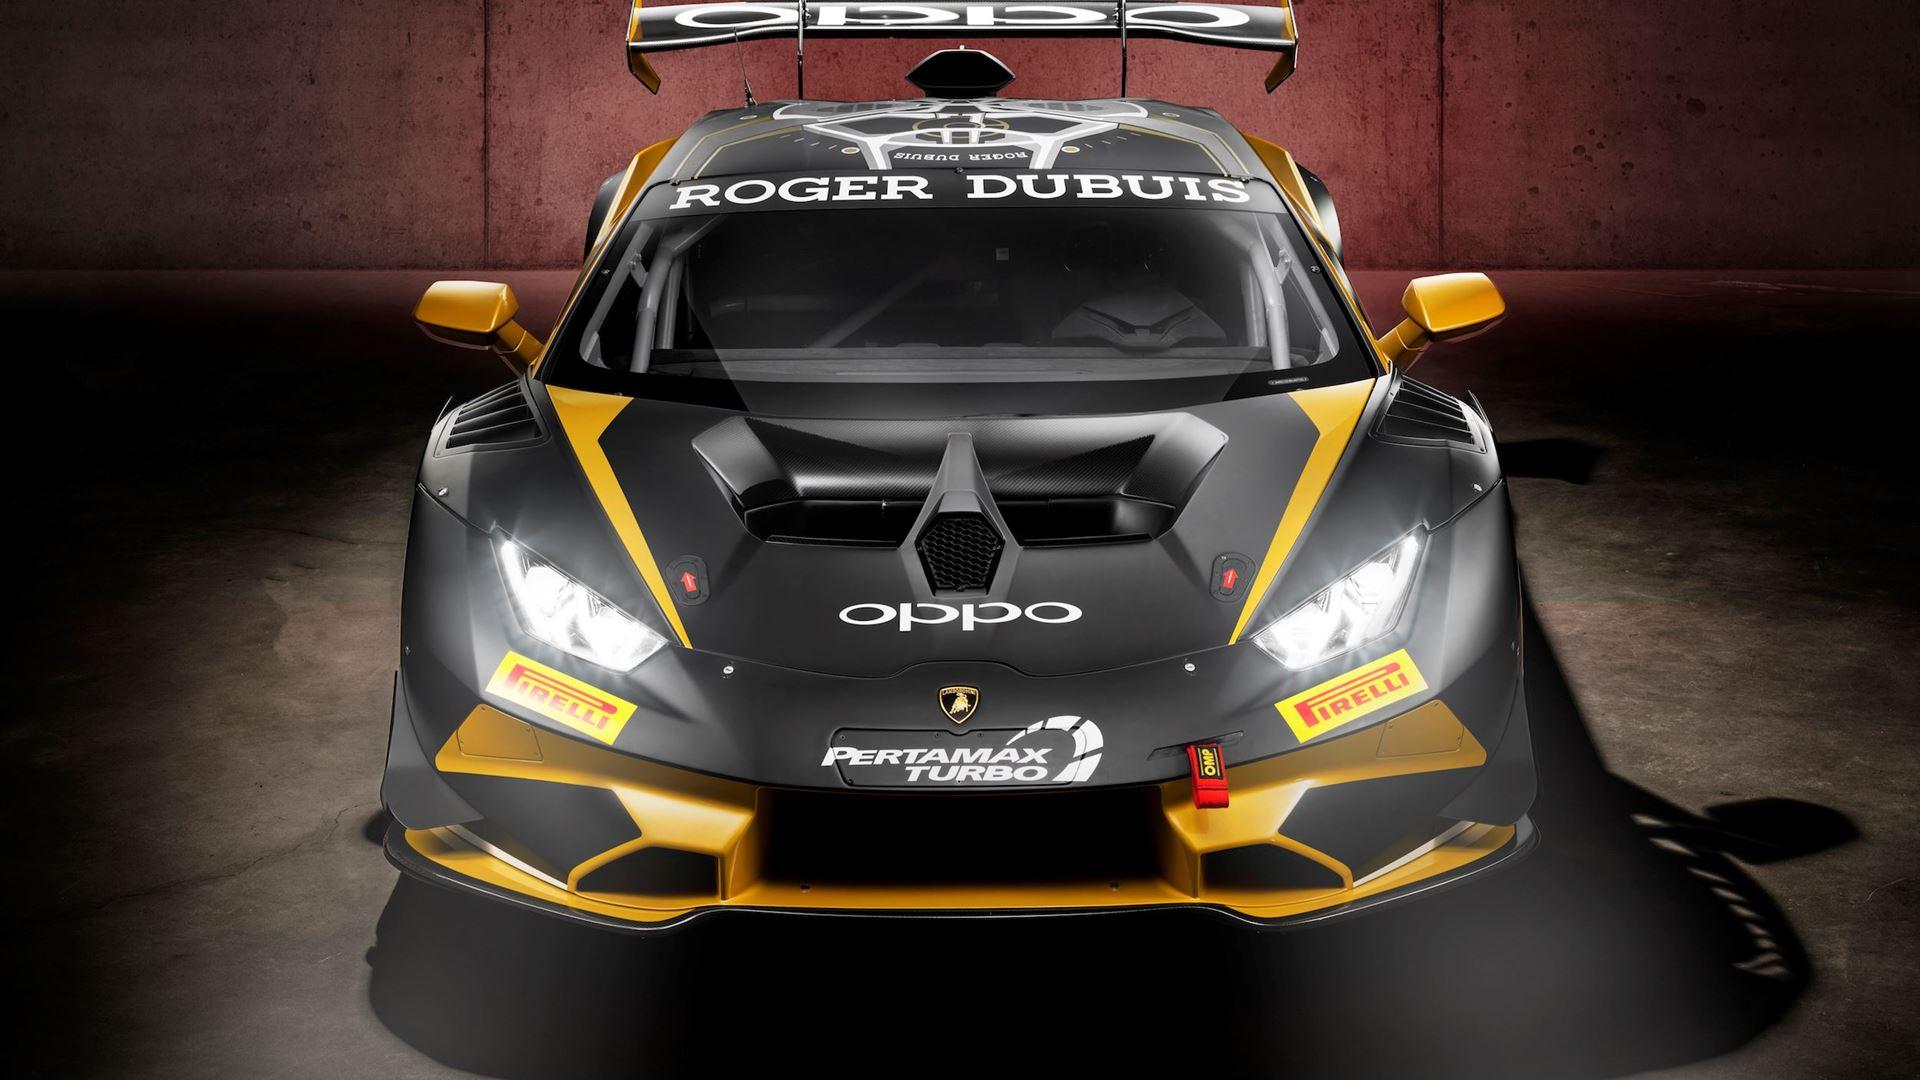 Lamborghini celebrates production of the 400th Huracán racing car - Image 2